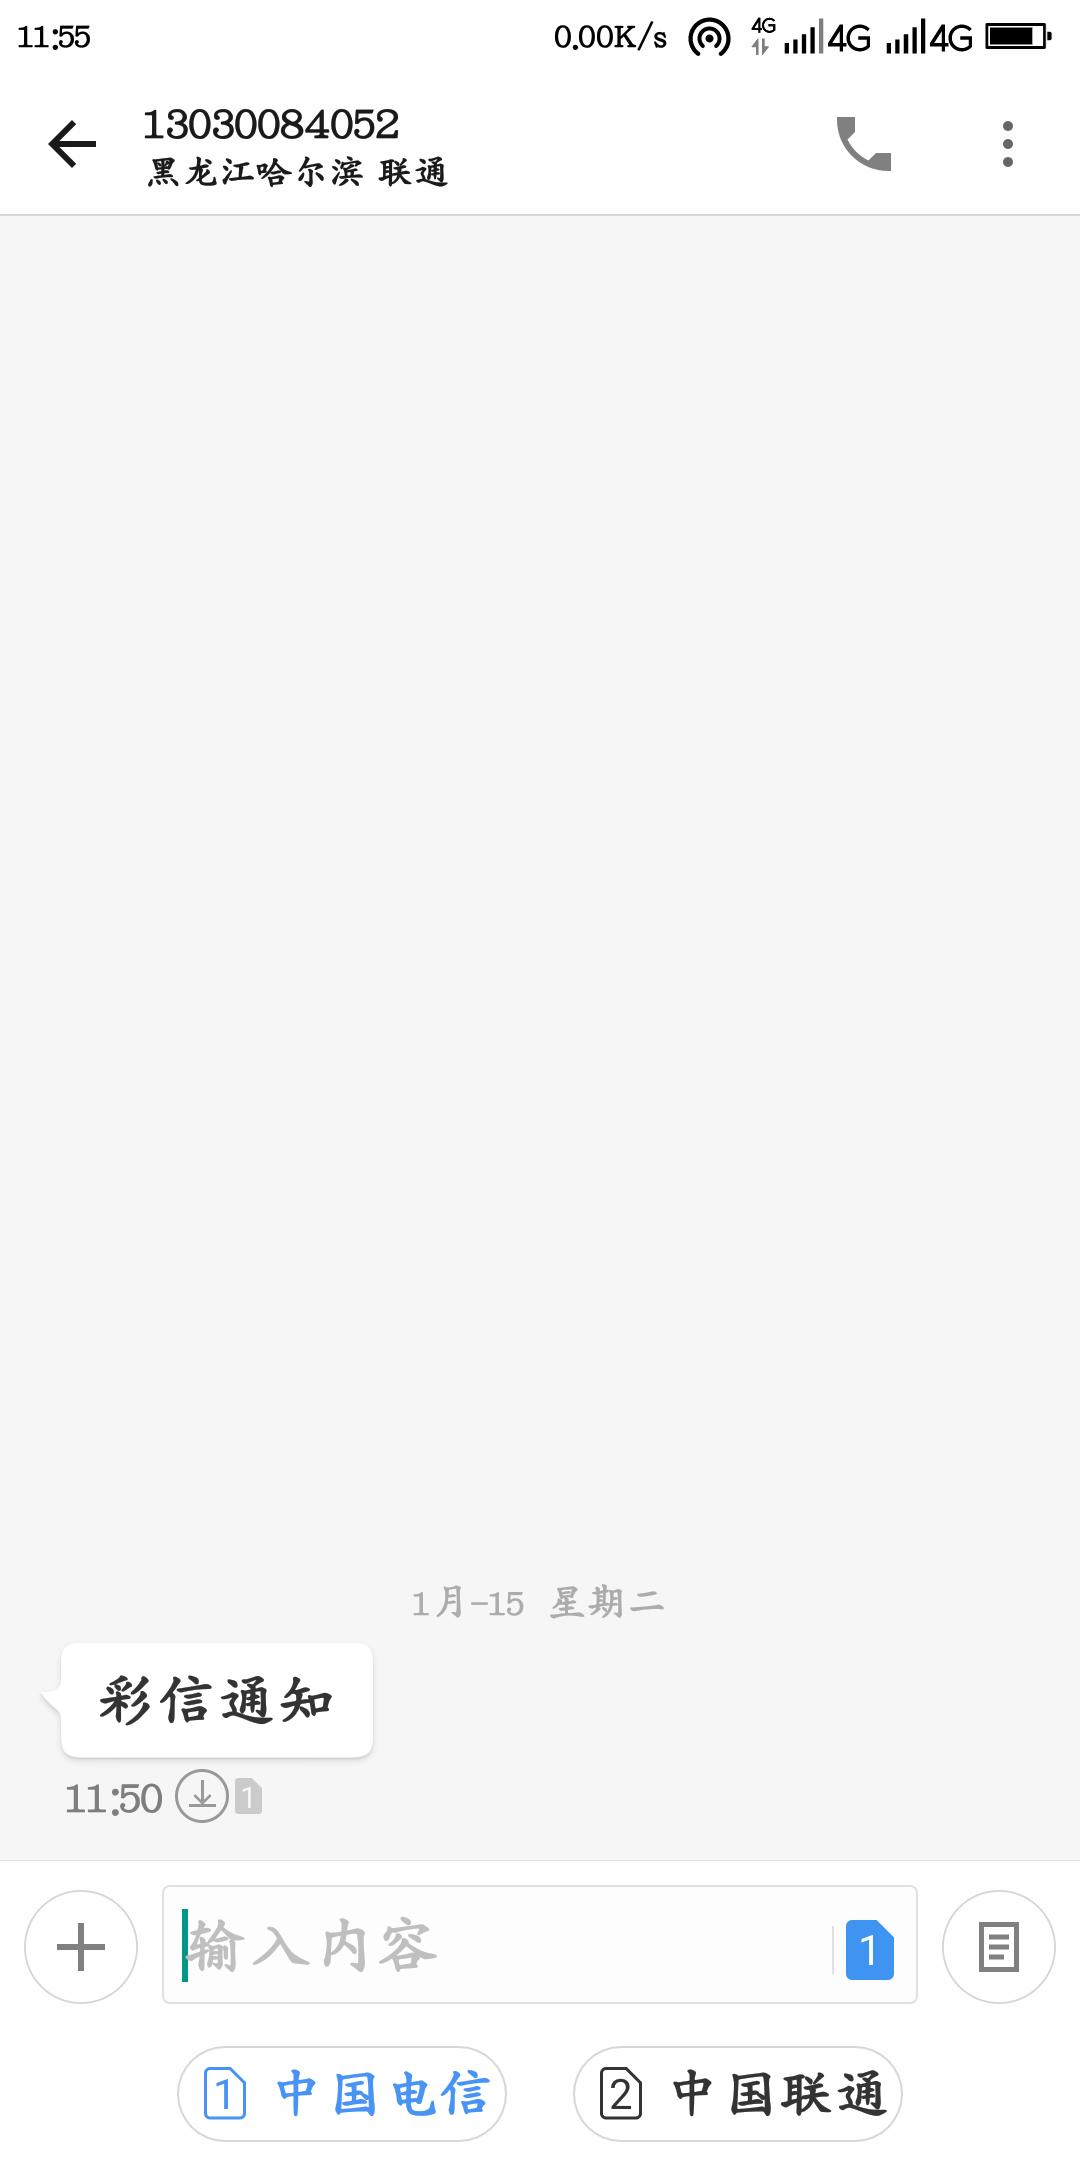 Screenshot_2019-01-15-11-55-46.png